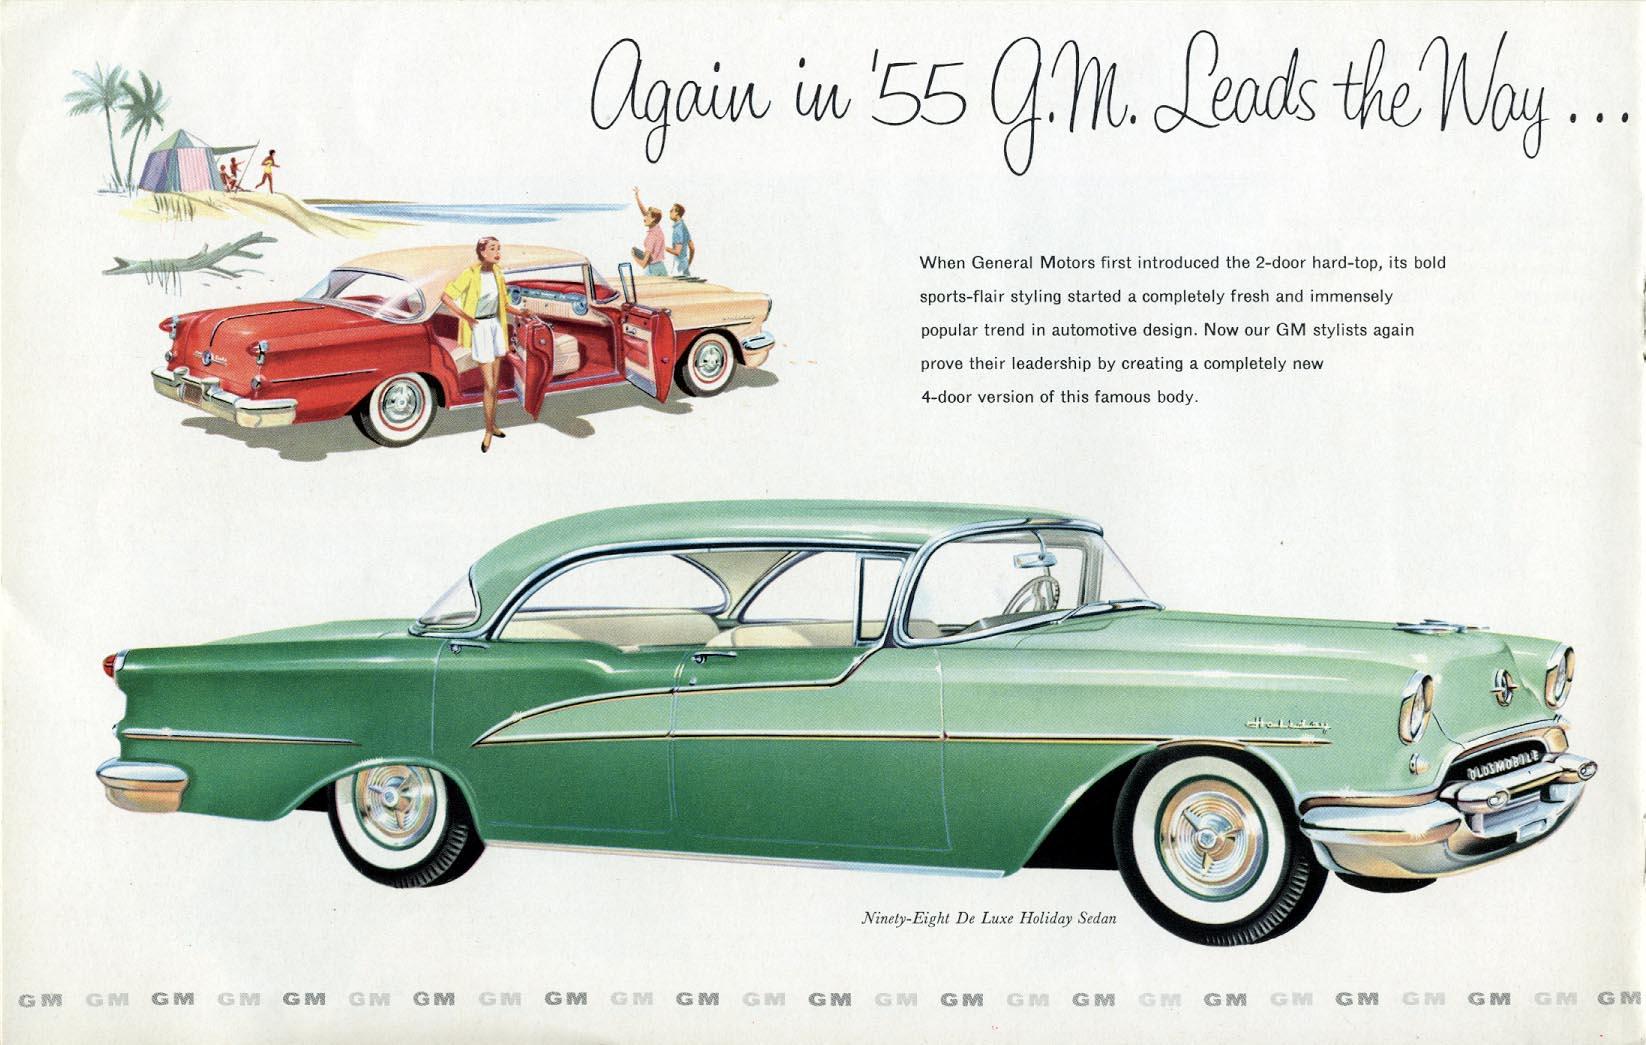 1955 General Motors Car